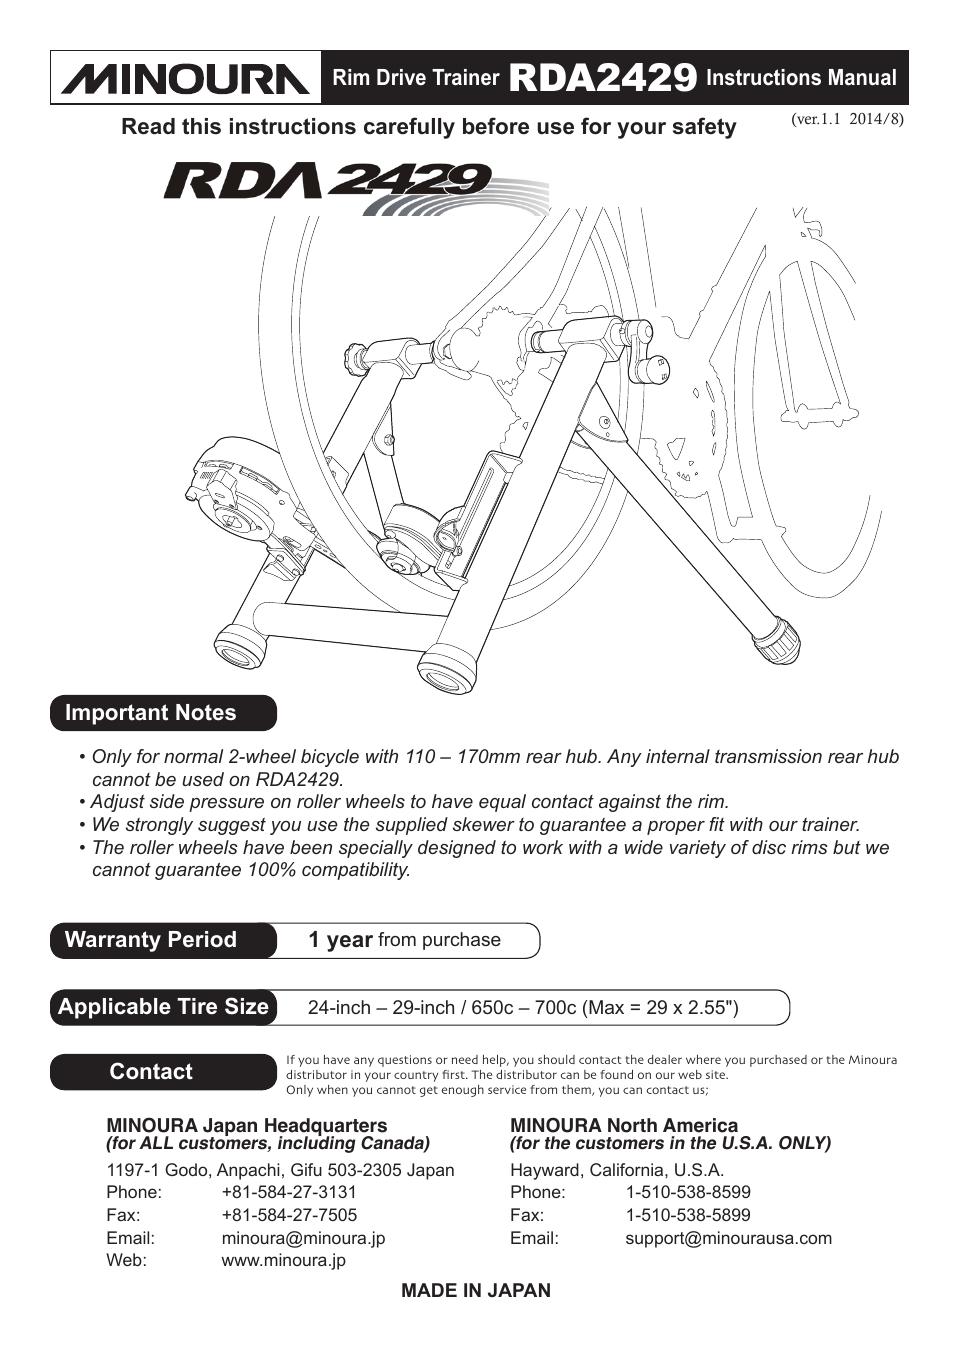 MINOURA RDA2429 User Manual | 8 pages